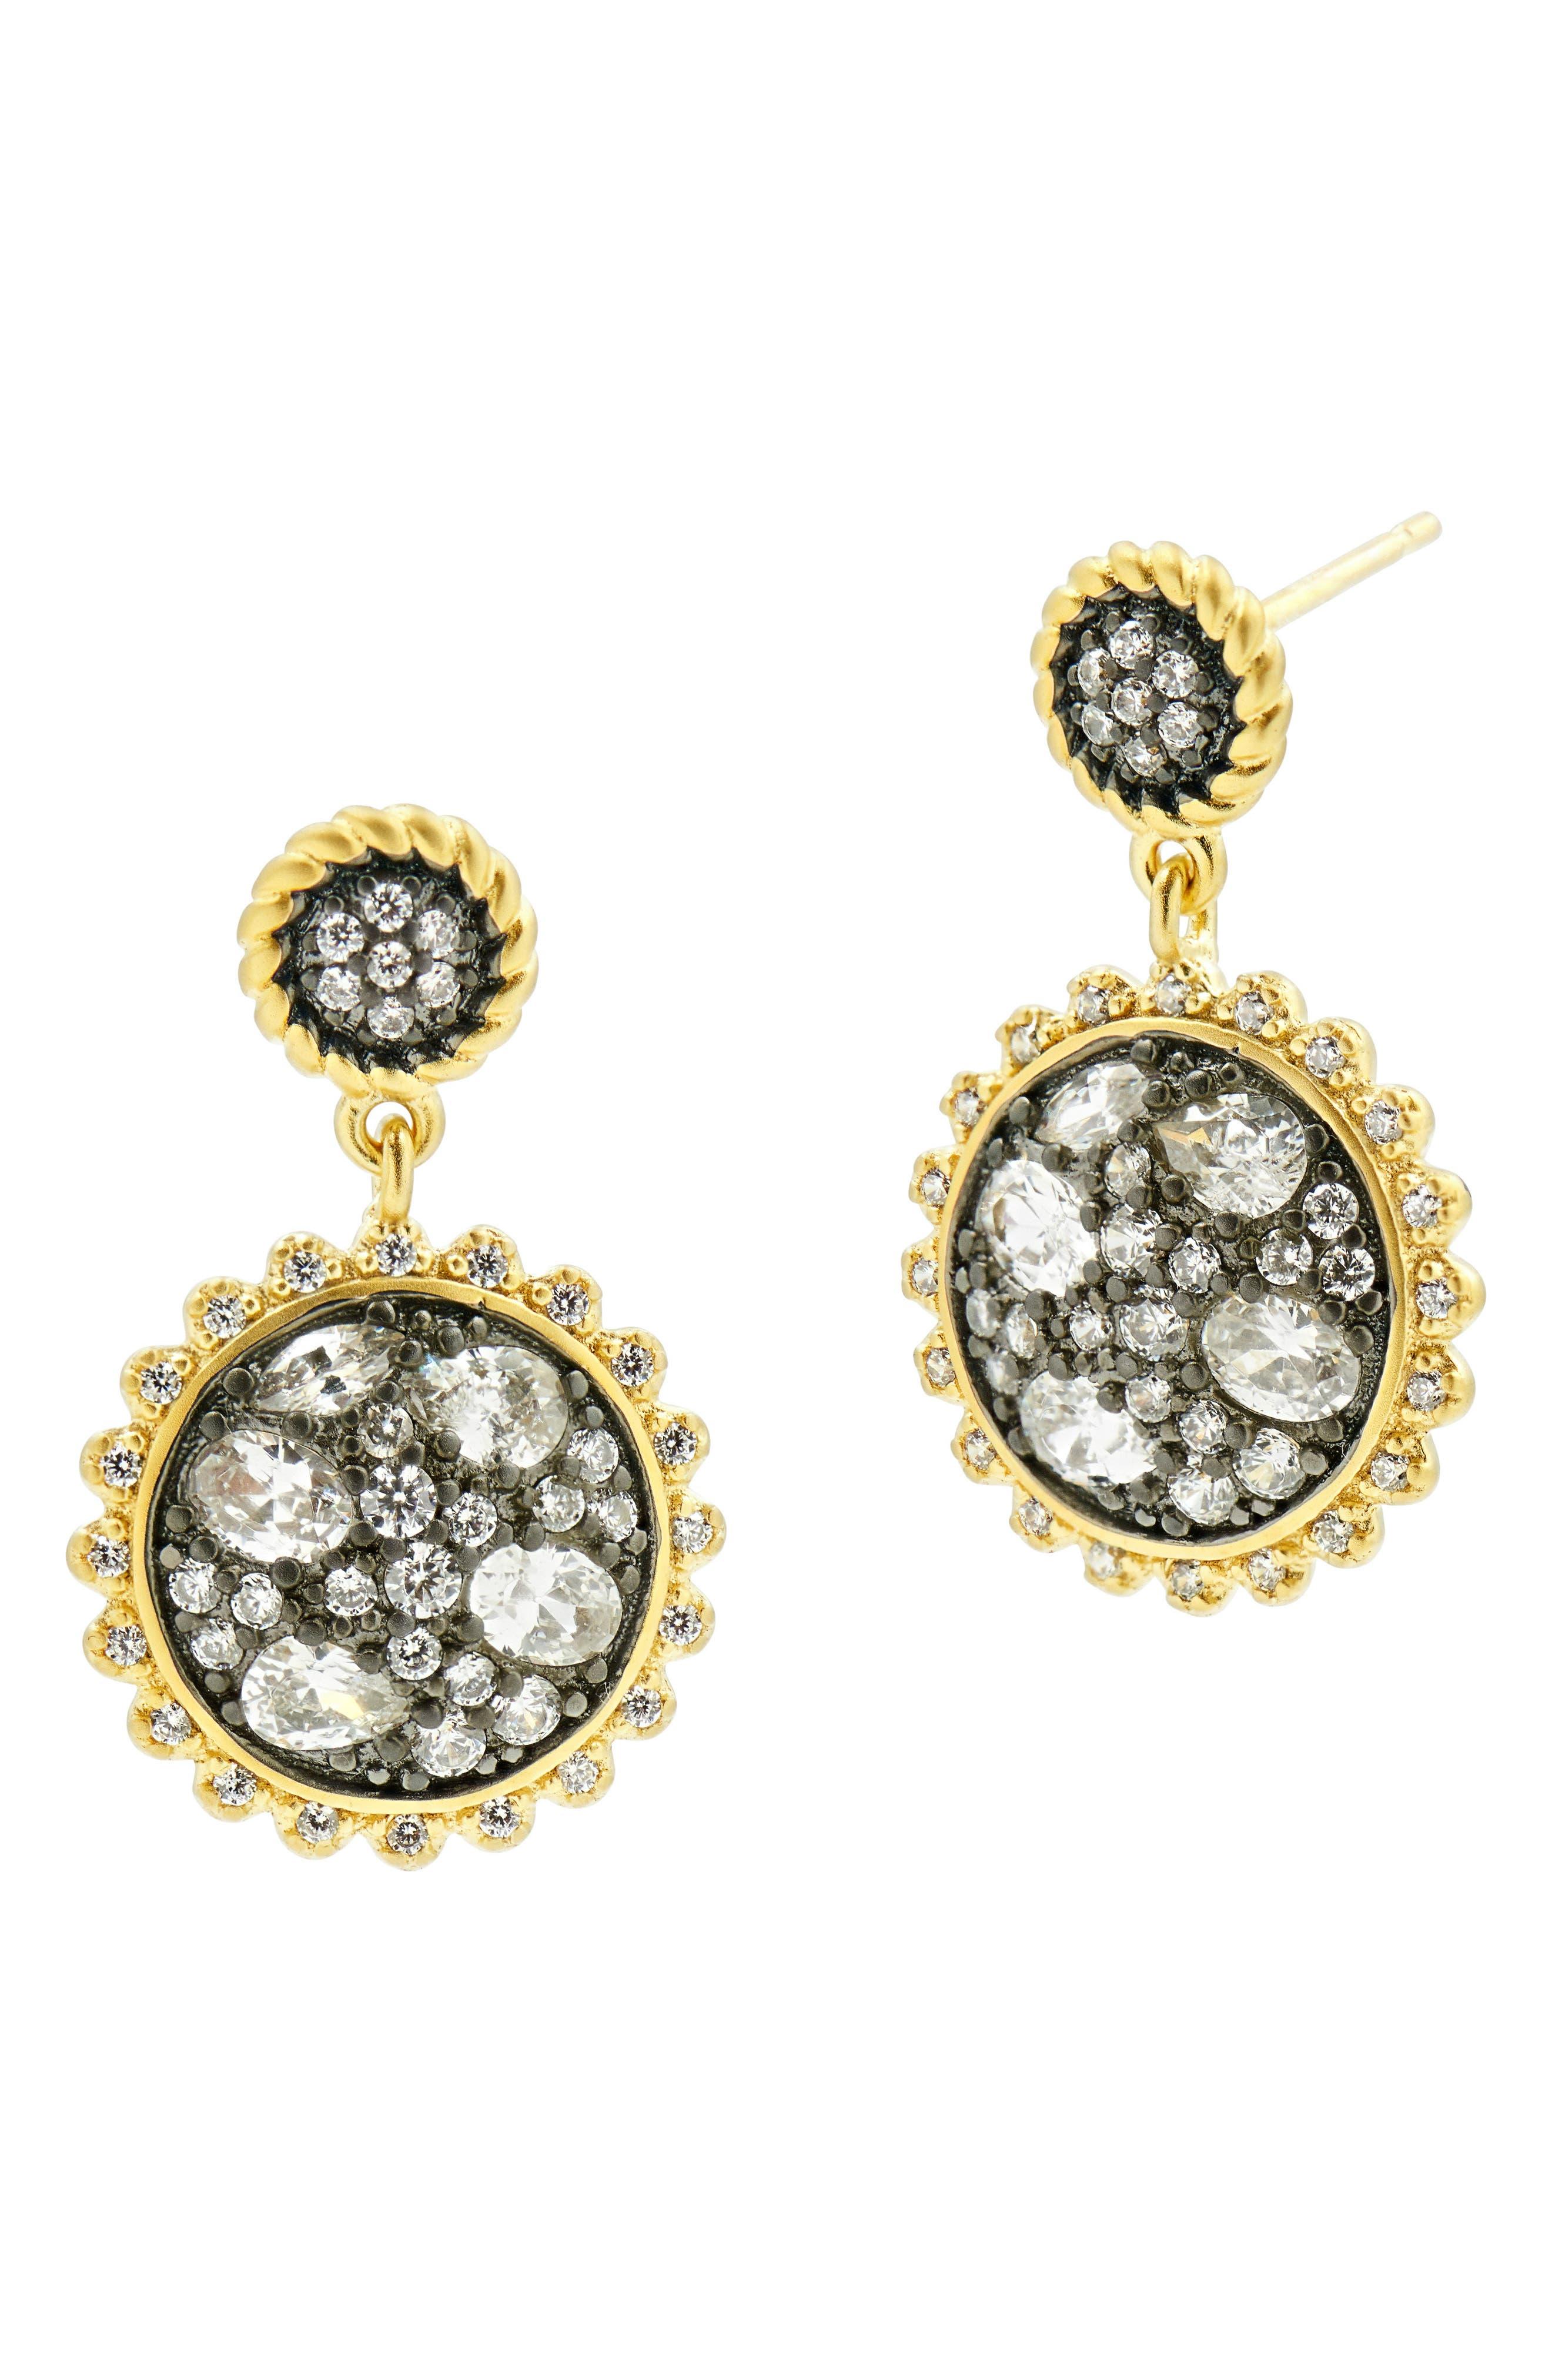 Main Image - FREIDA ROTHMAN Gilded Cable Pebble Small Stone Earrings